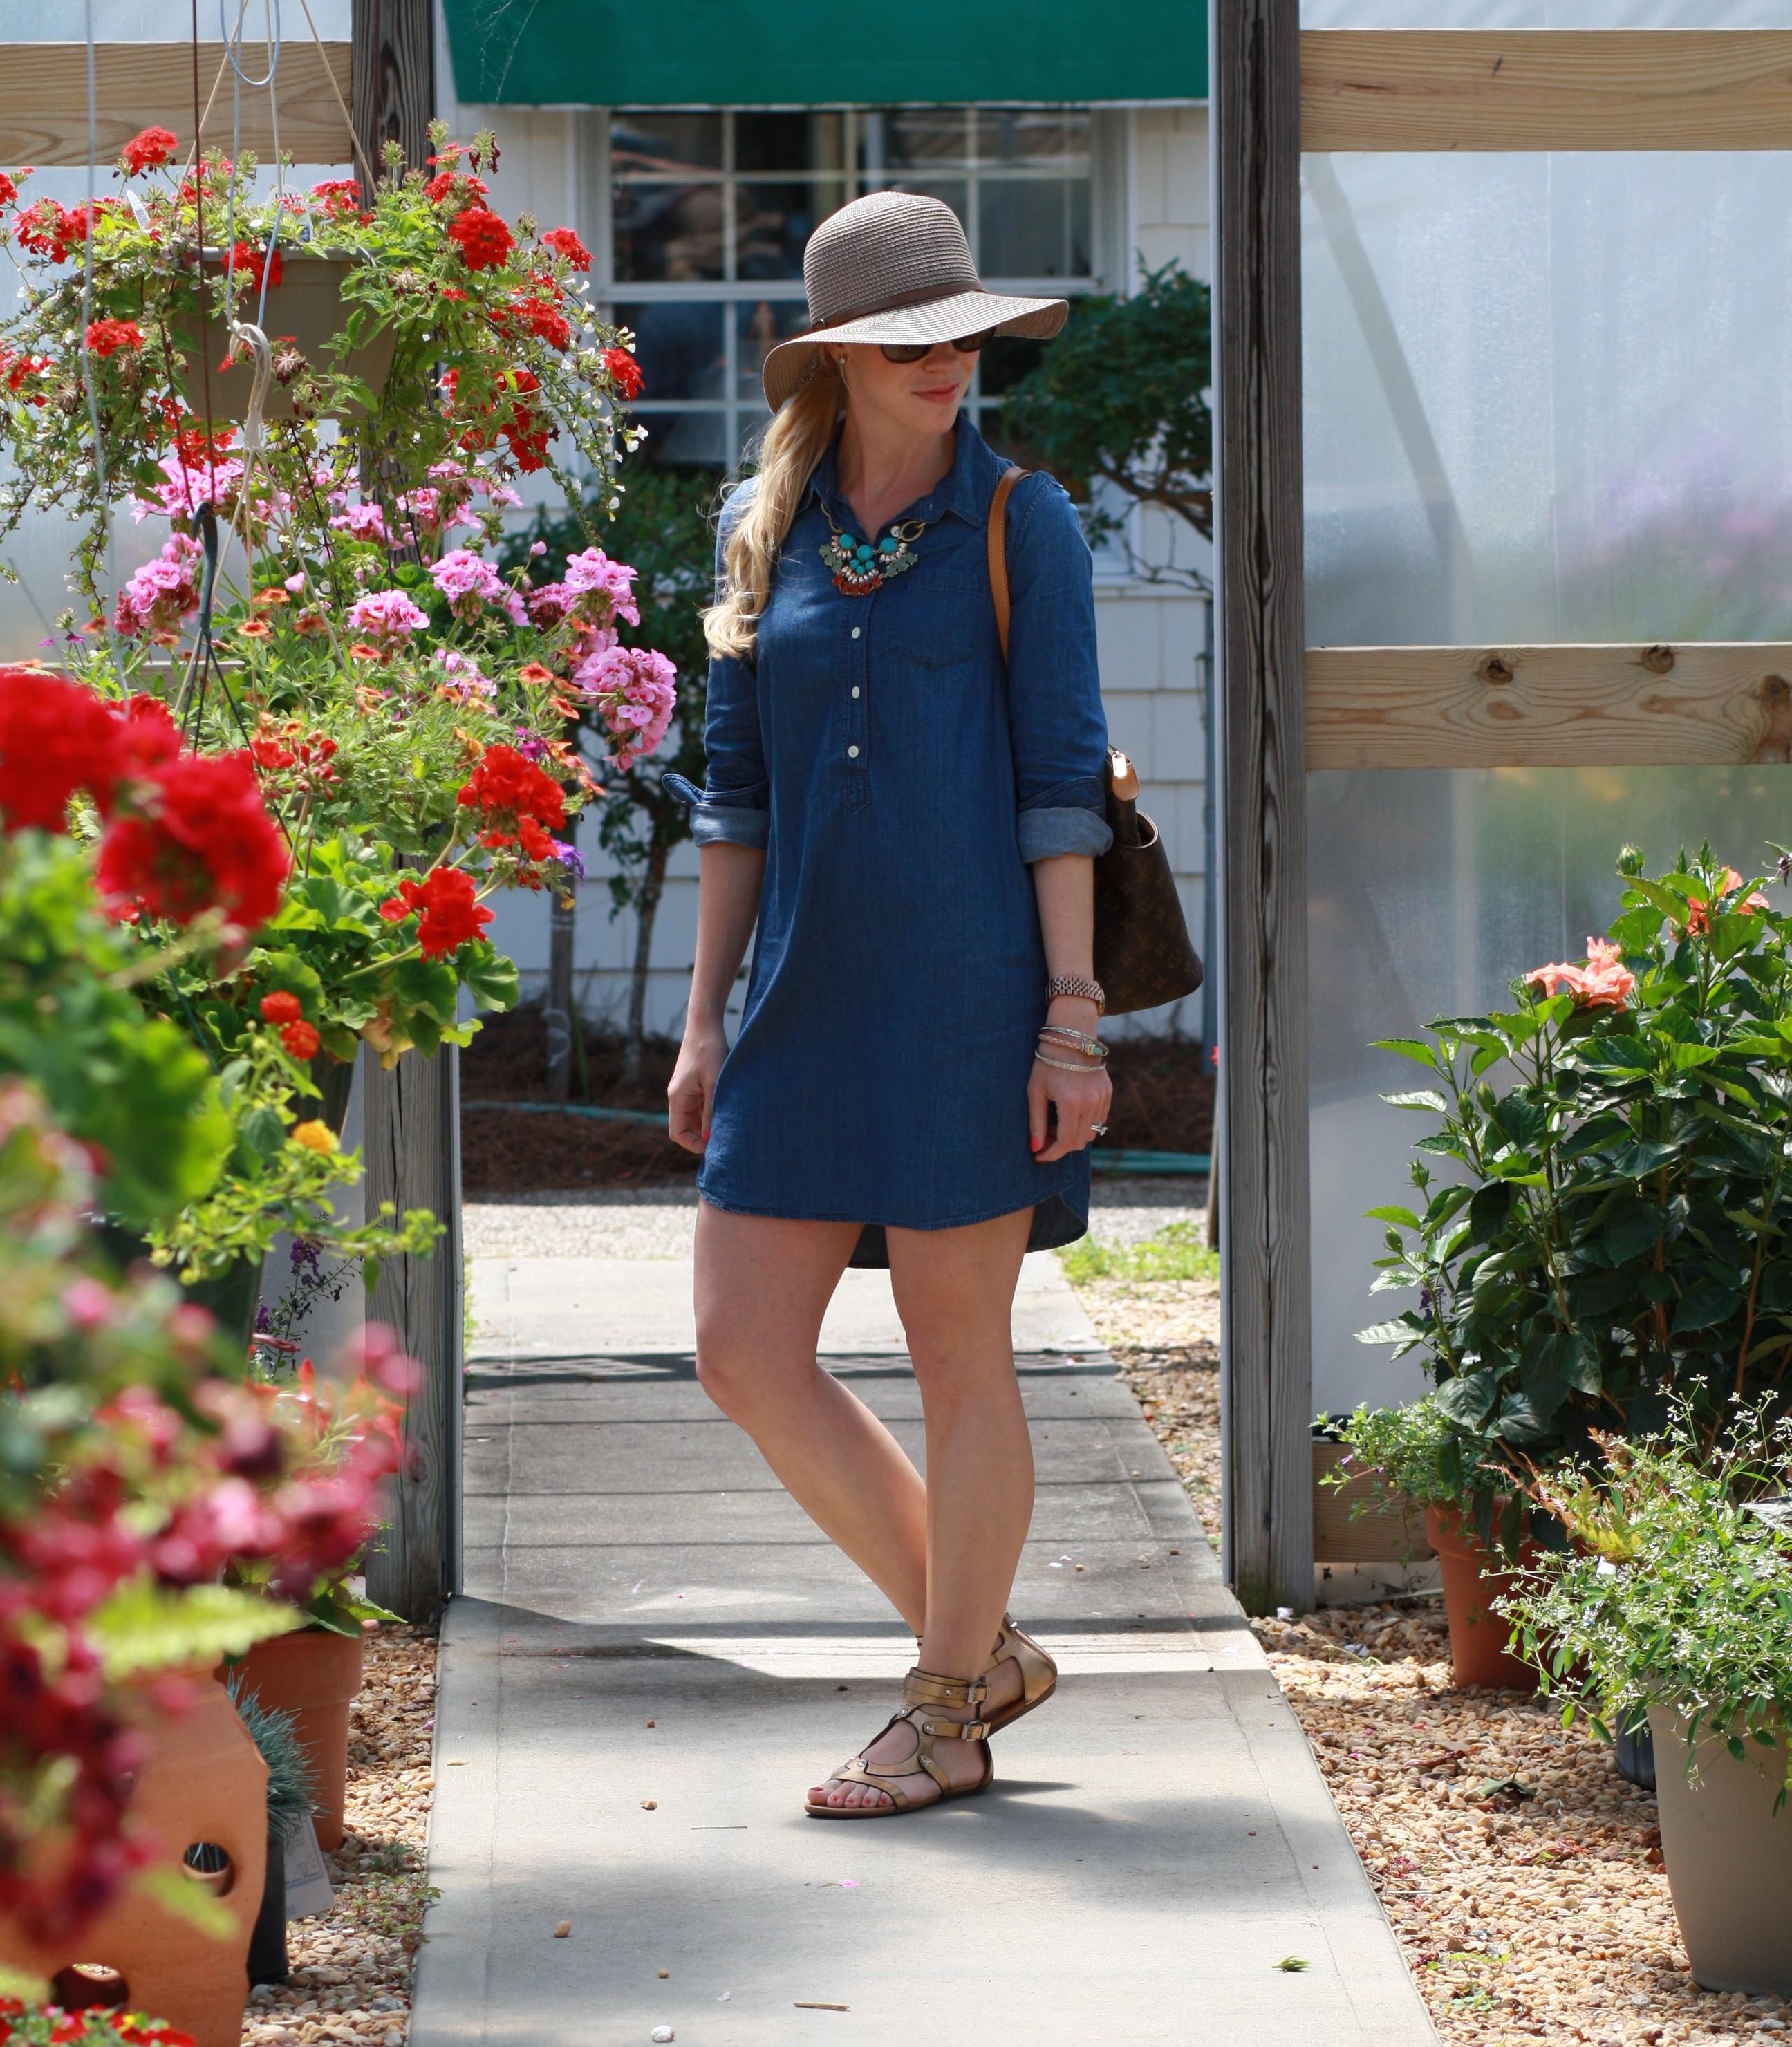 bd4228cc990da7 brown floppy straw hat, turquoise necklace, chambray denim shirt dress,  Louis Vuitton MM tote, bronze gladiator sandals